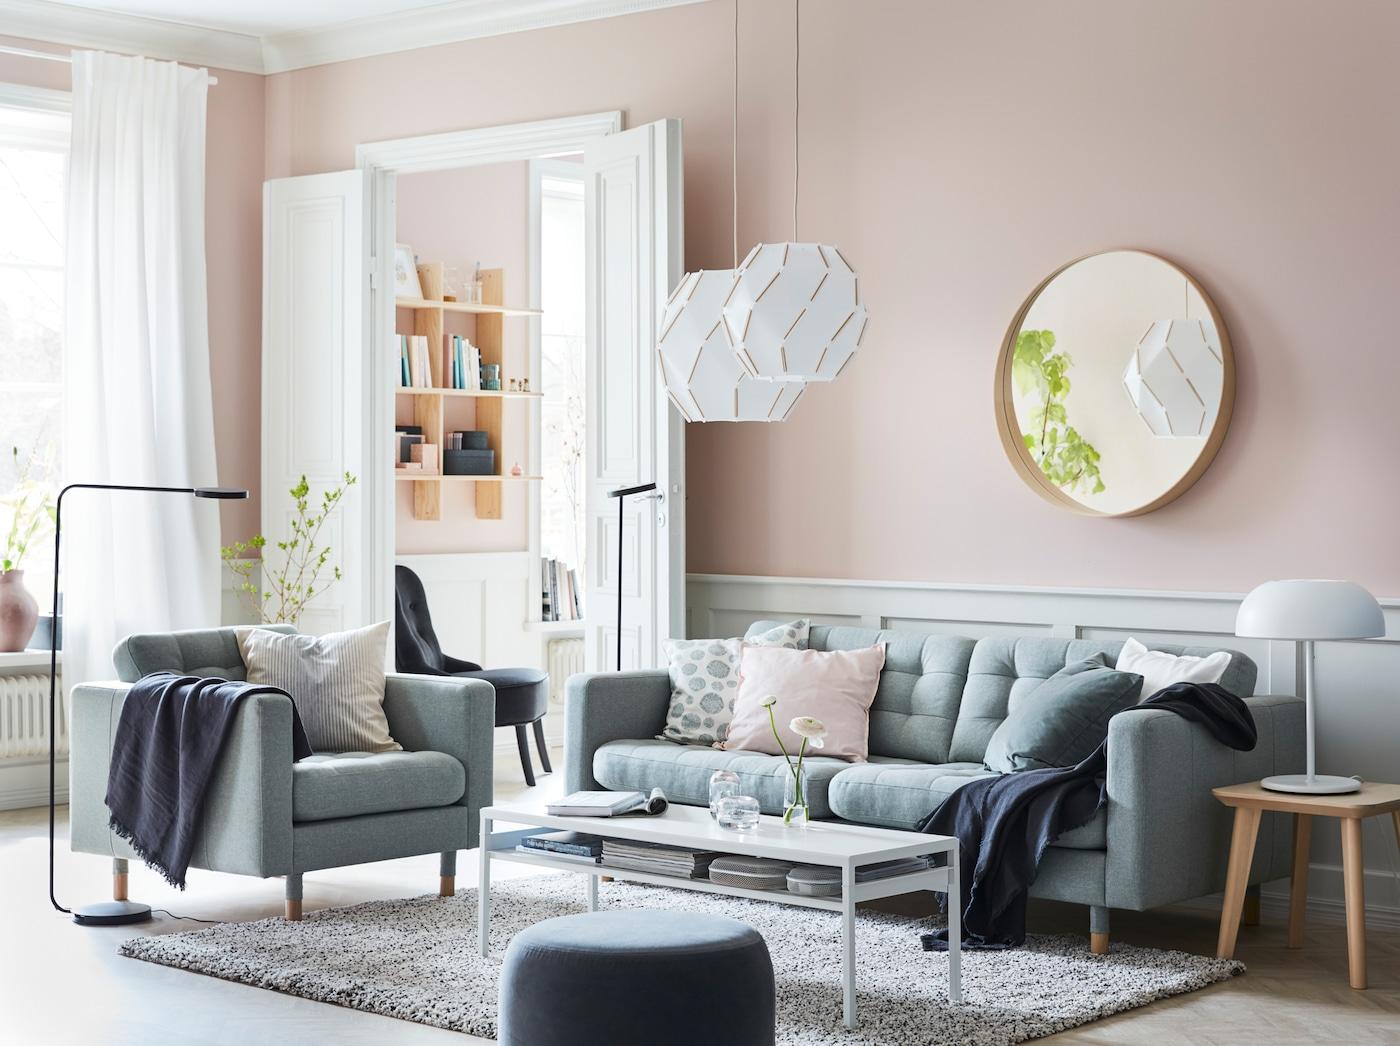 LANDSKRONA light green sofa sectional, SJÖPENNA pendant lamps and black YPPERLIG standing lamps in a pink walledl living room.